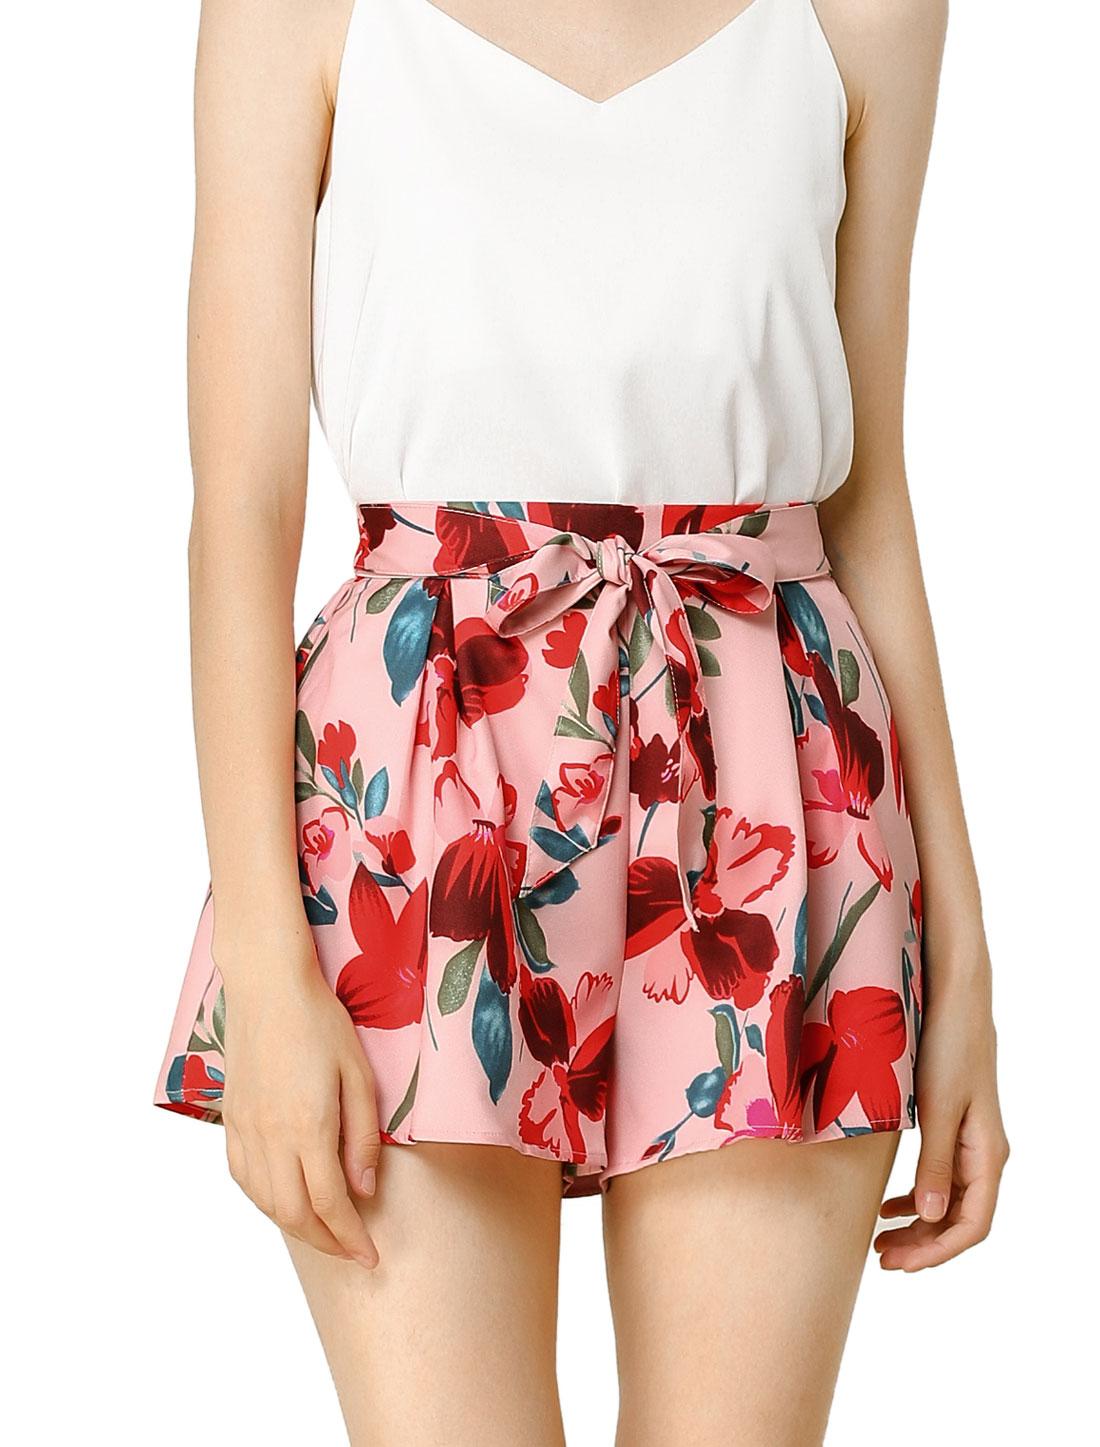 Women Elastic Waist Floral Print Summer Boho Beach Shorts Pink S